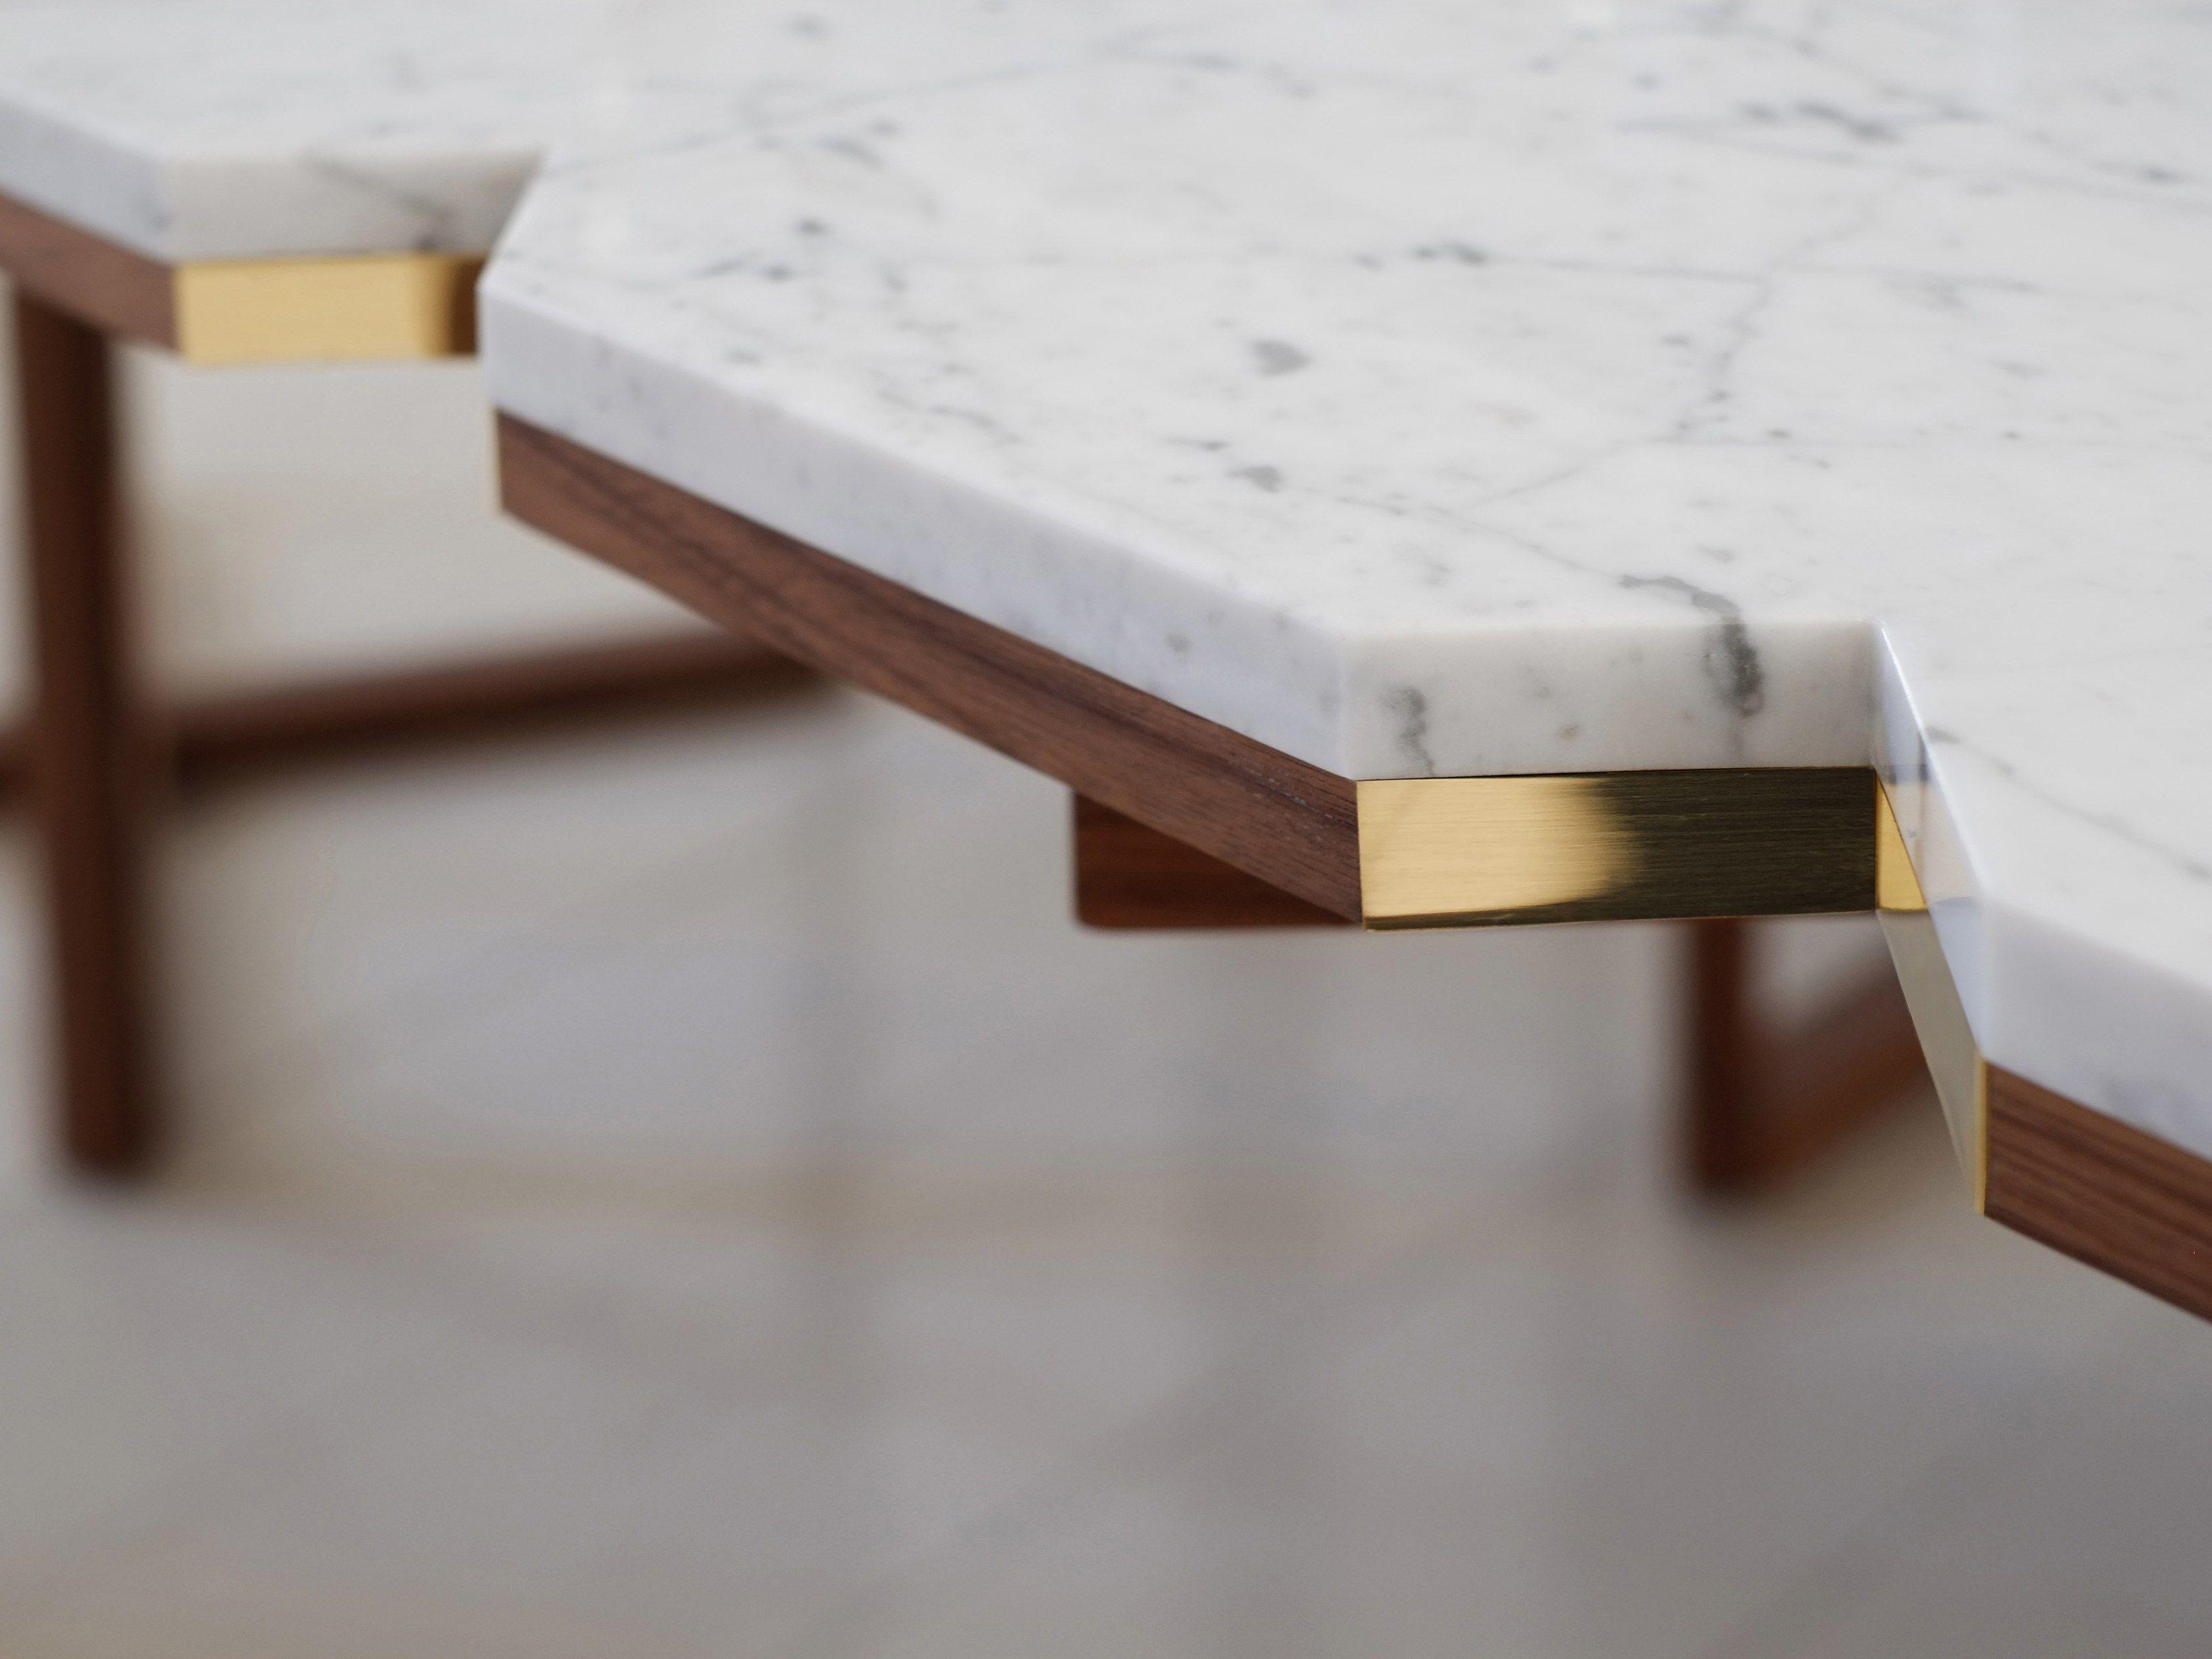 Dining Table Marble Table By Efasma Design Bureau De Change